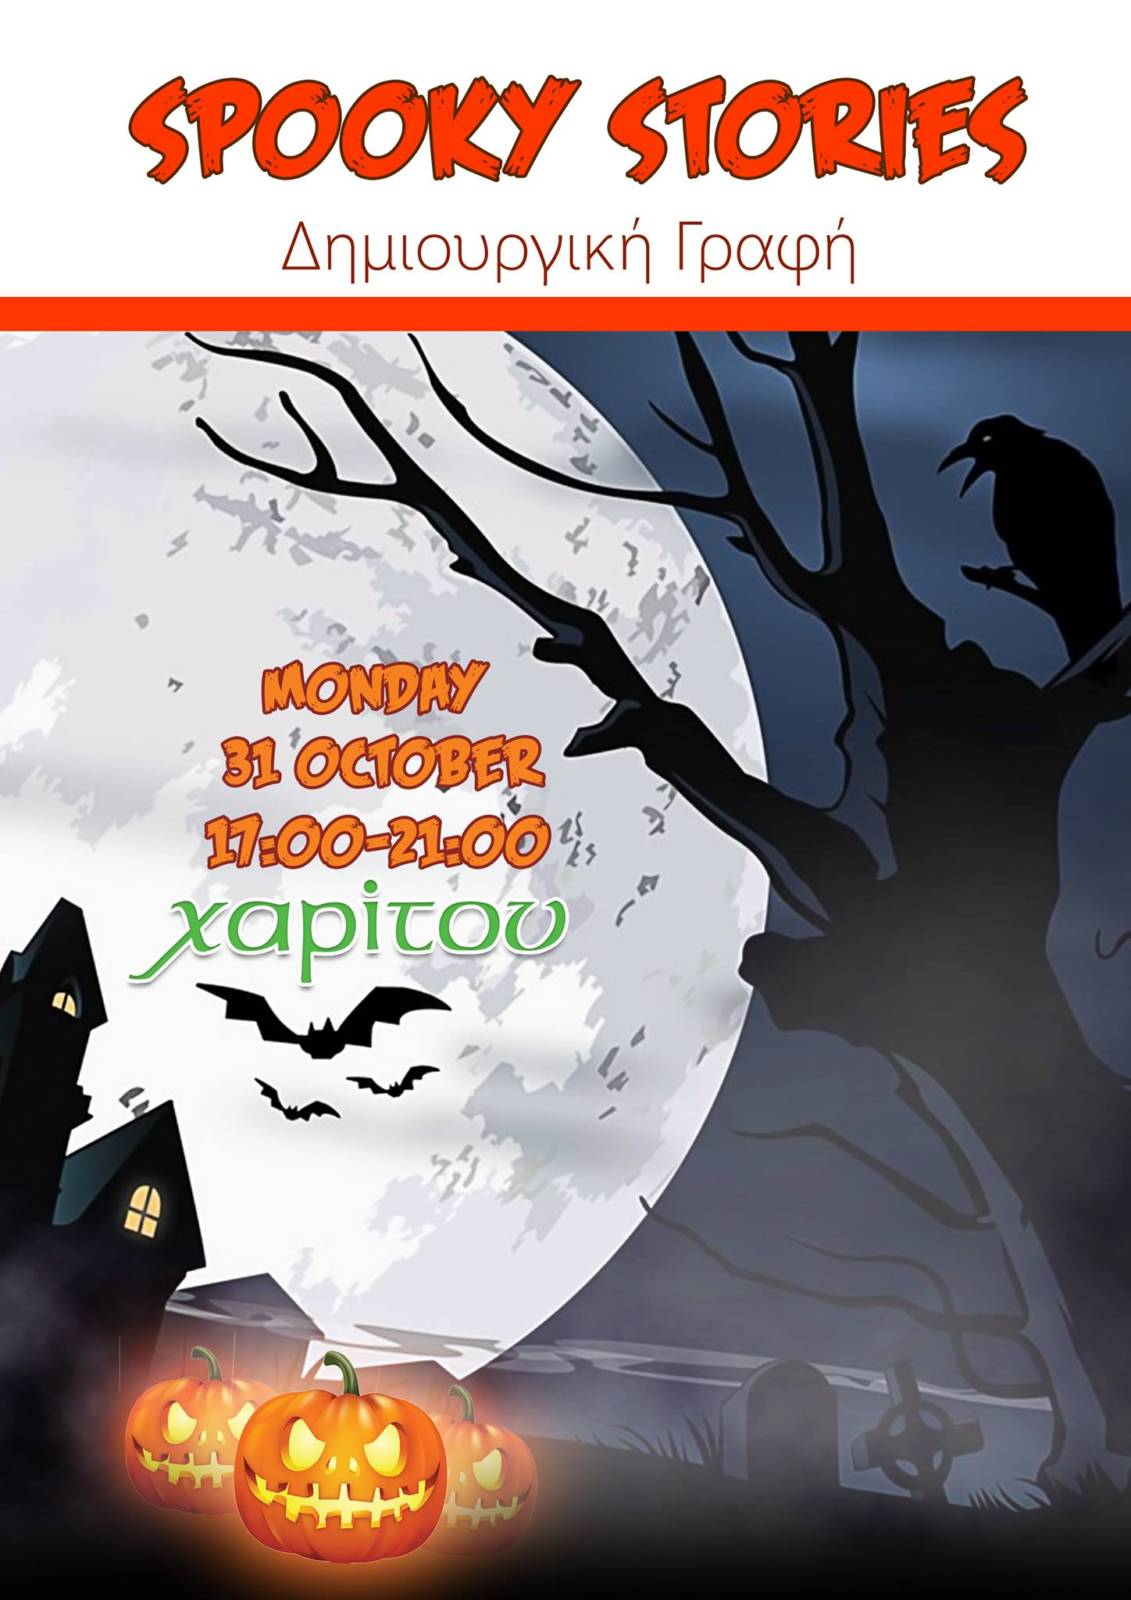 eleni-gkora-spookystories-1